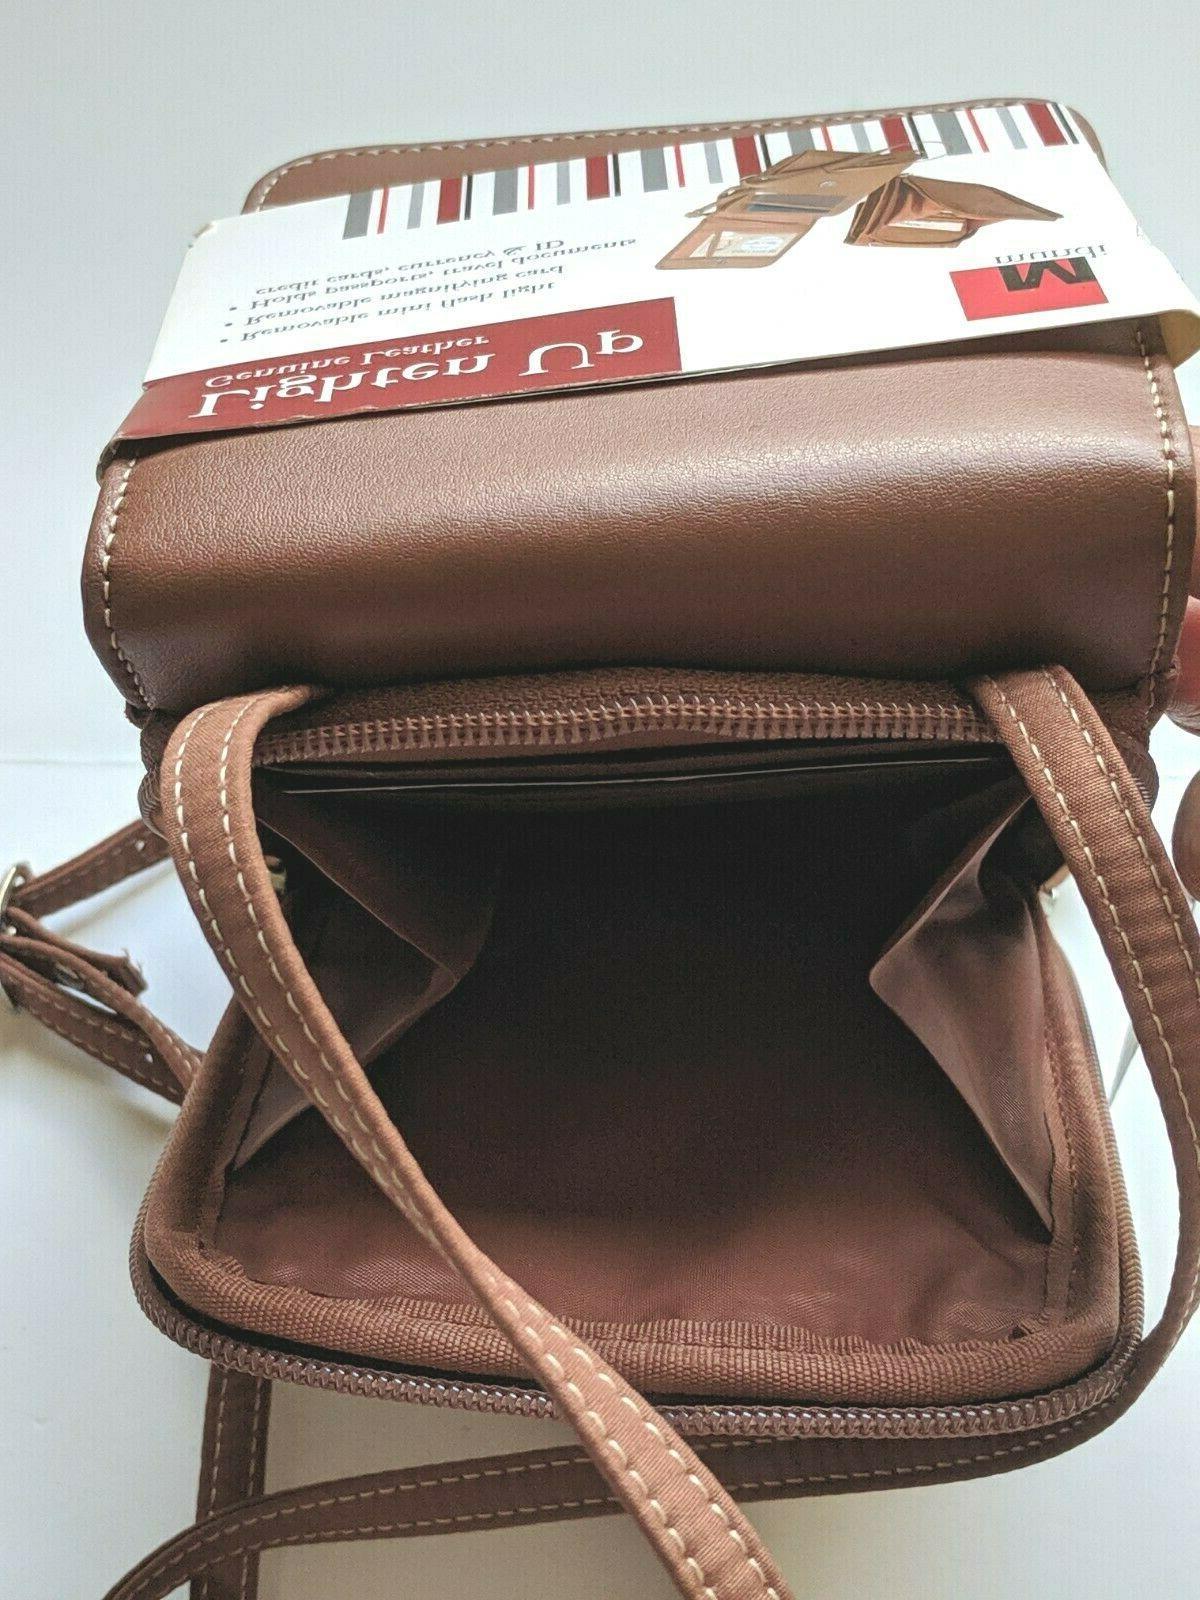 New! Leather Lighten Up Bag Strap